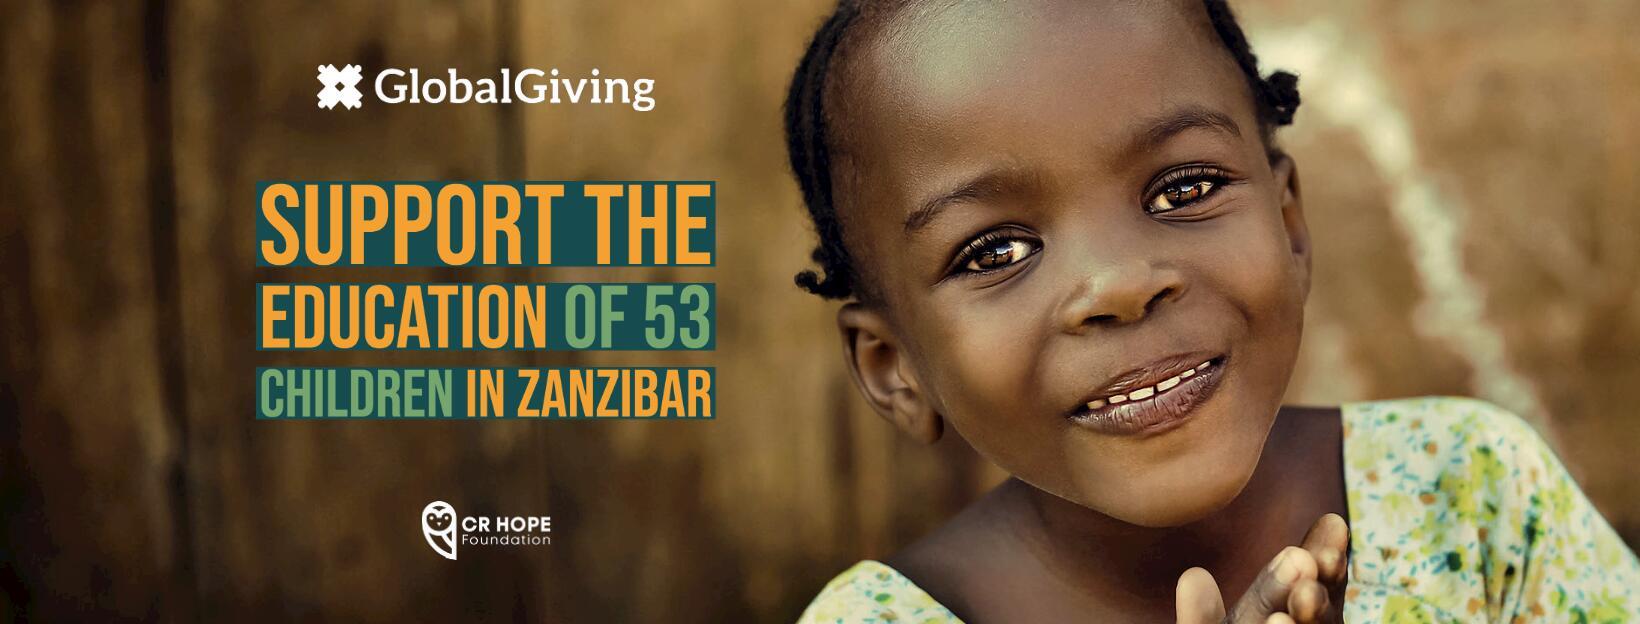 Support the Education of 53 Children in Zanzibar